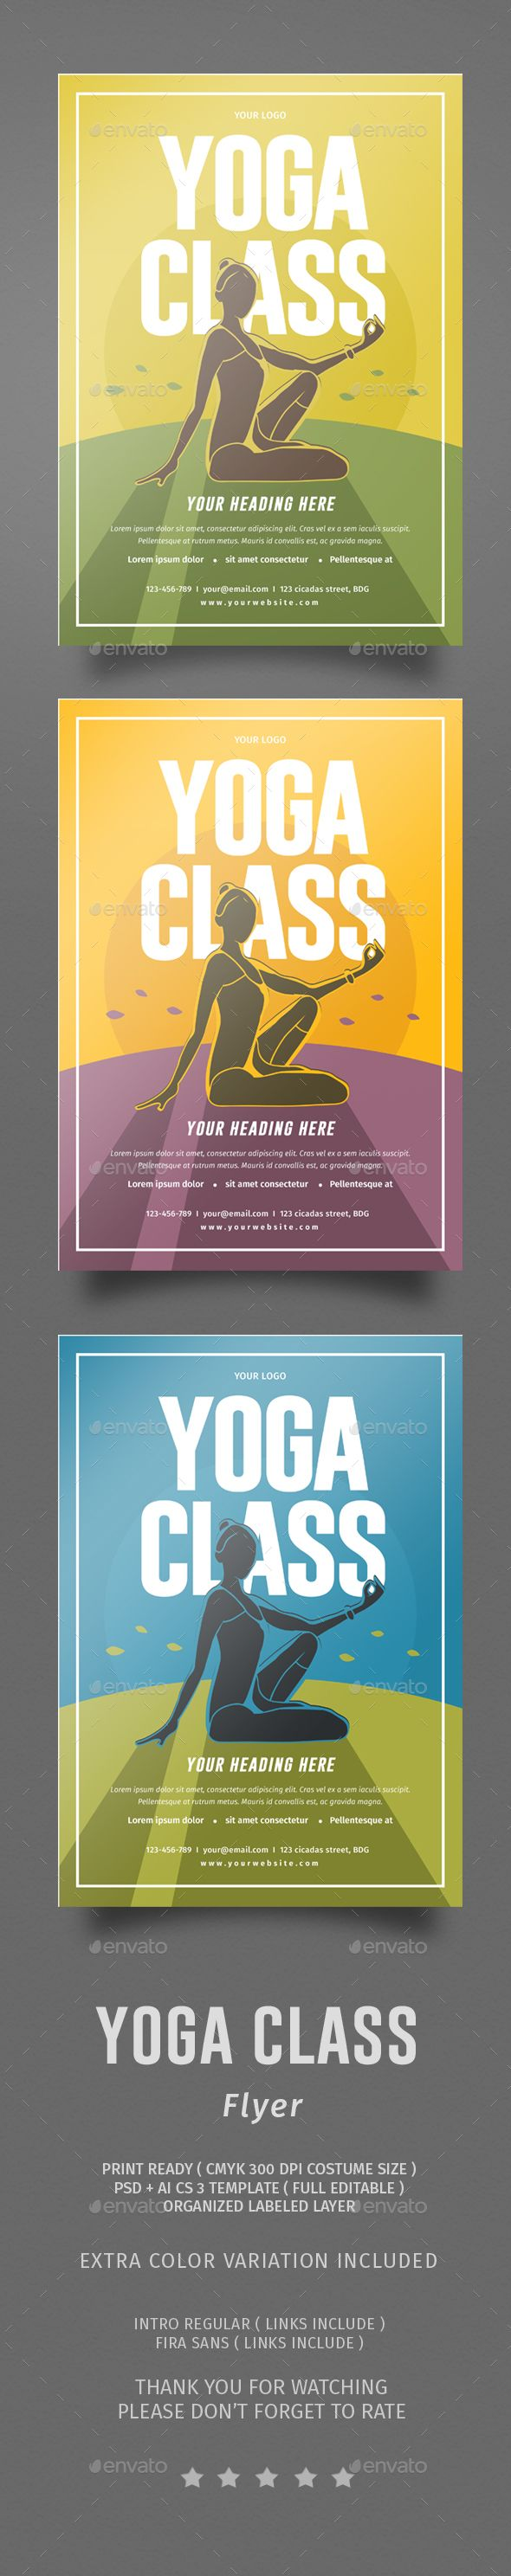 yoga brochure templates free.html